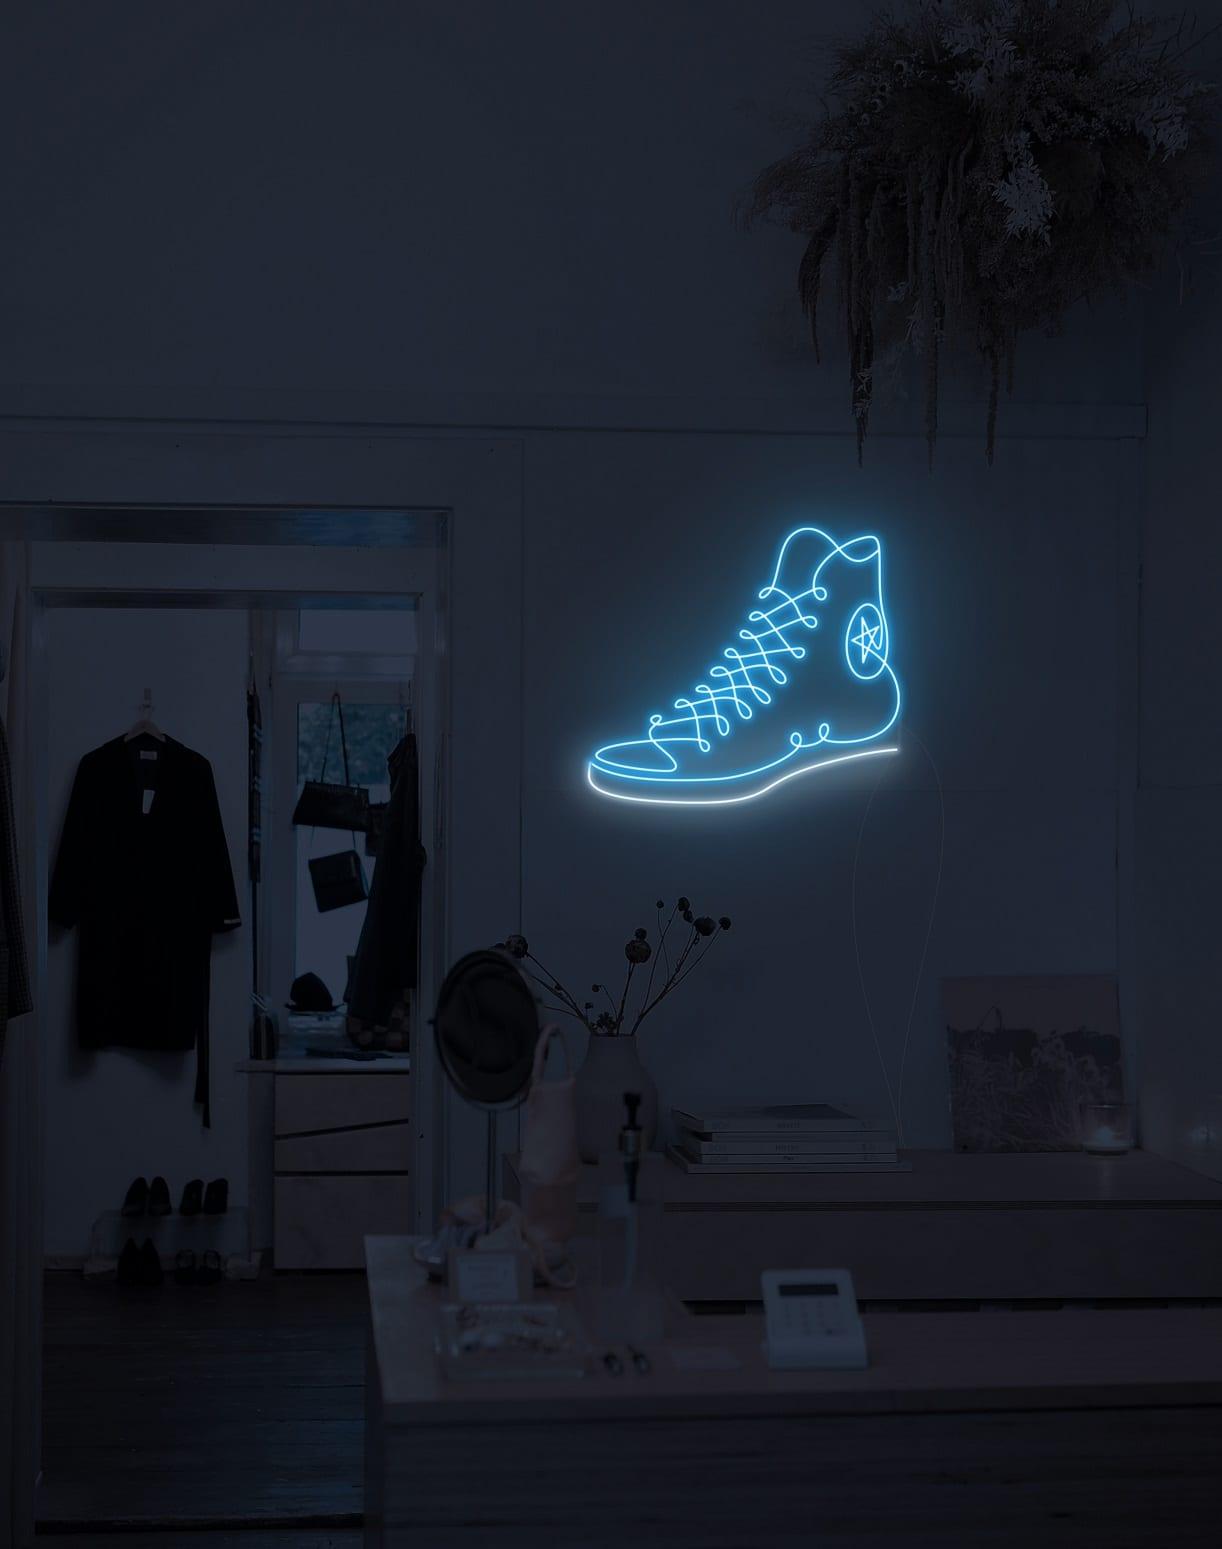 converse neon signs